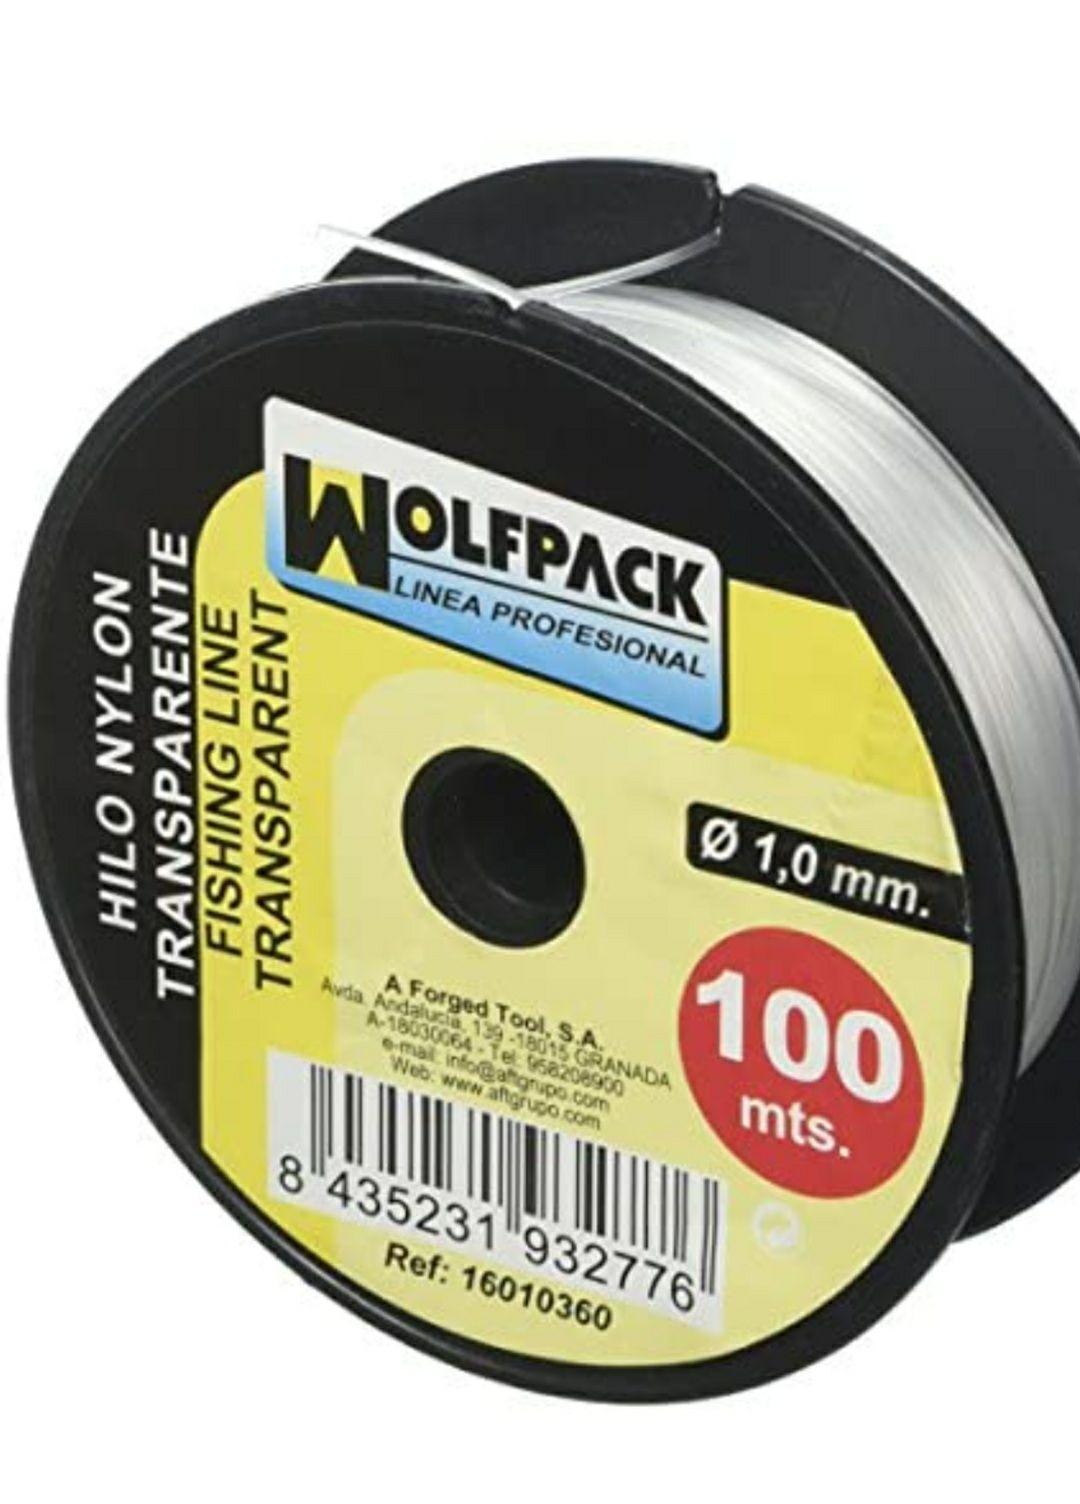 WOLFPACK LINEA PROFESIONAL 16010360 Hilo Nylon Transparente 1.0 mm. Rollo 100 m